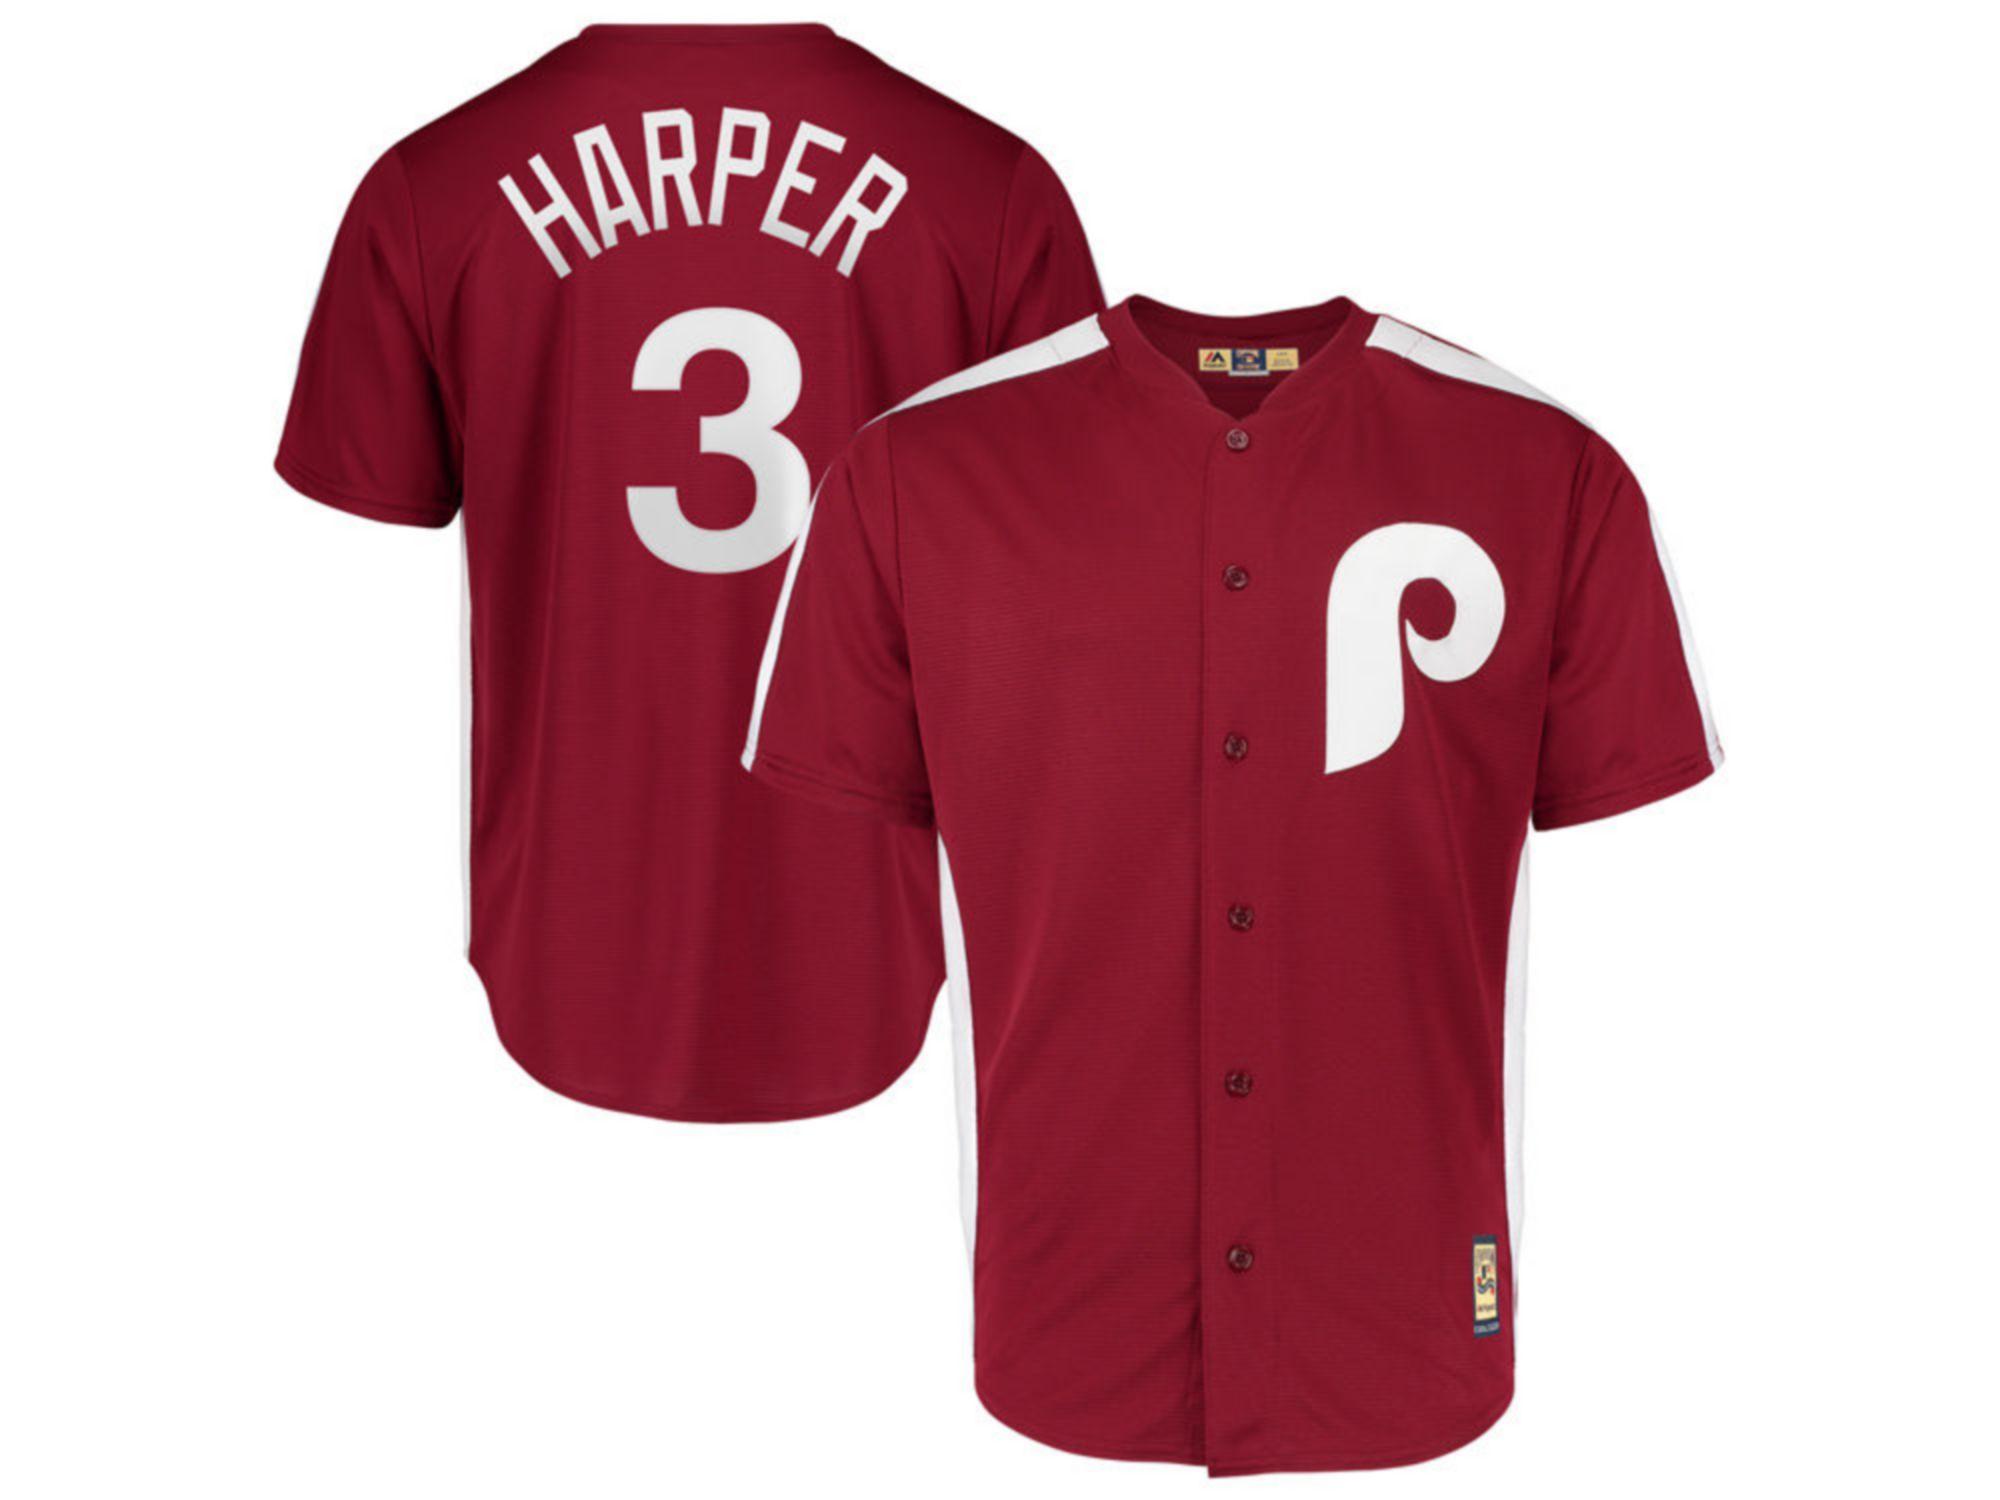 Majestic Philadelphia Phillies Men's Cooperstown Player Replica Cool Base Jersey Bryce Harper & Reviews - MLB - Sports Fan Shop - Macy's